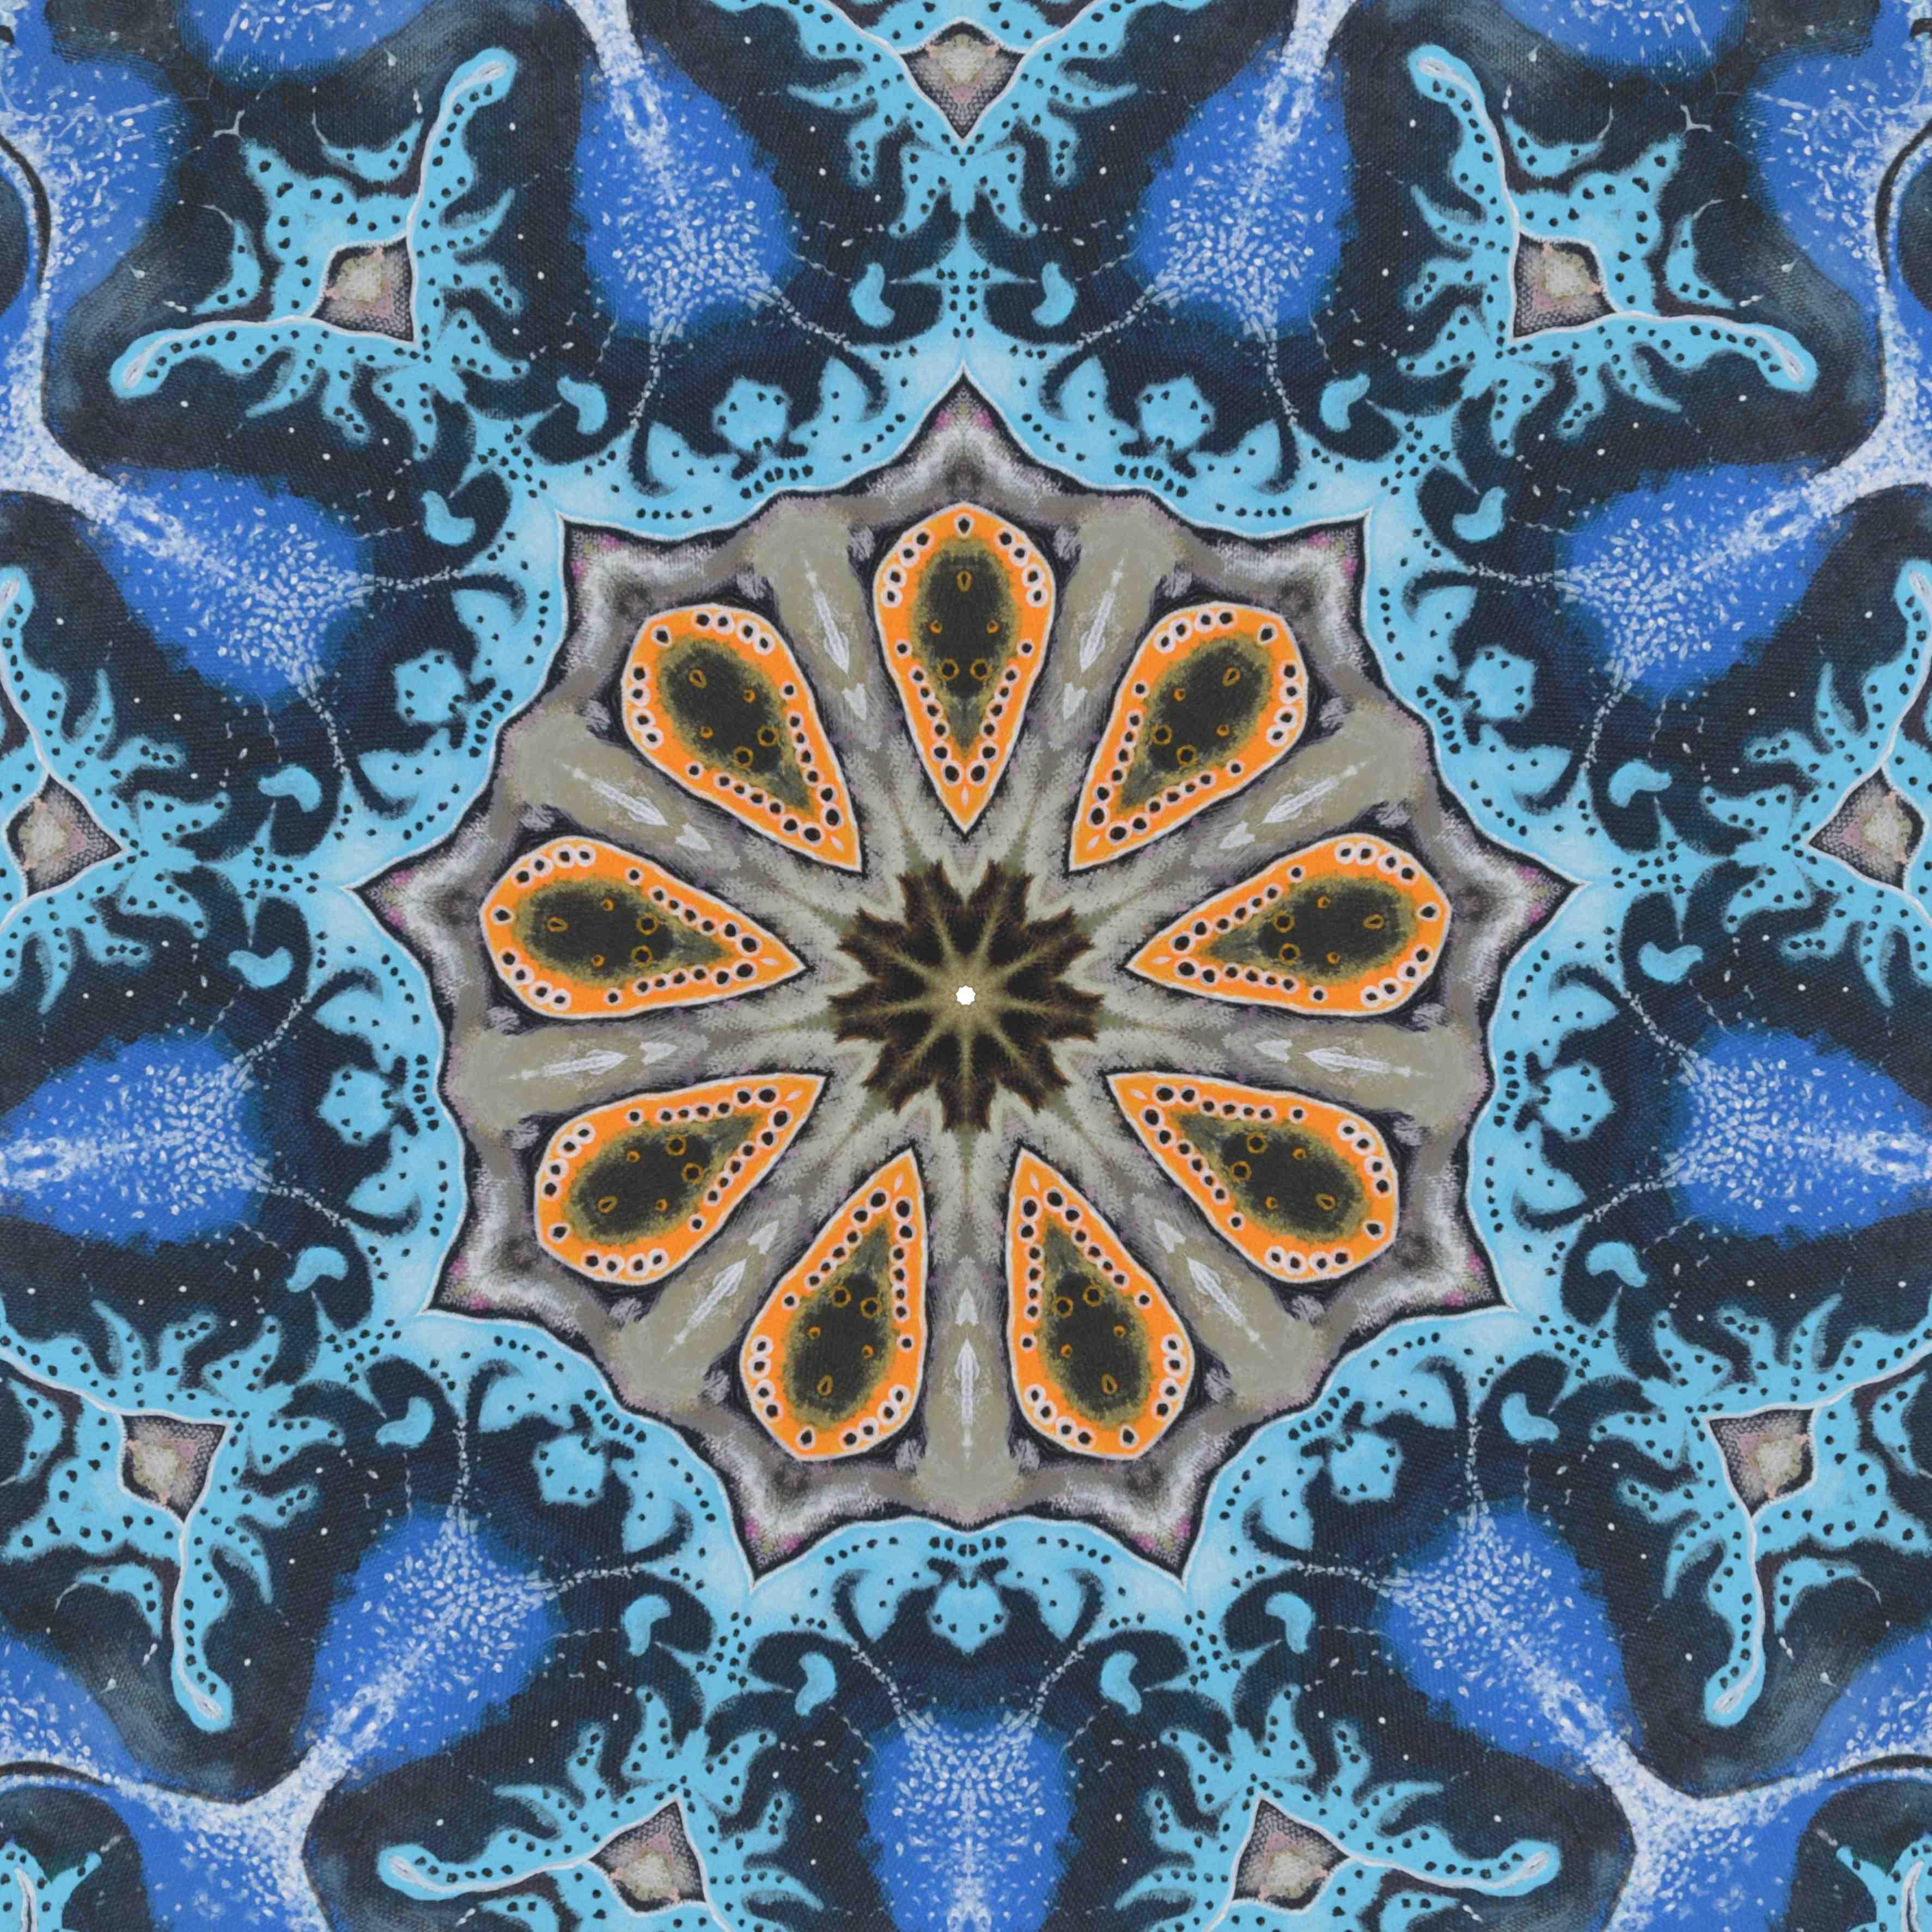 Fabric design GC #1_1i.jpg